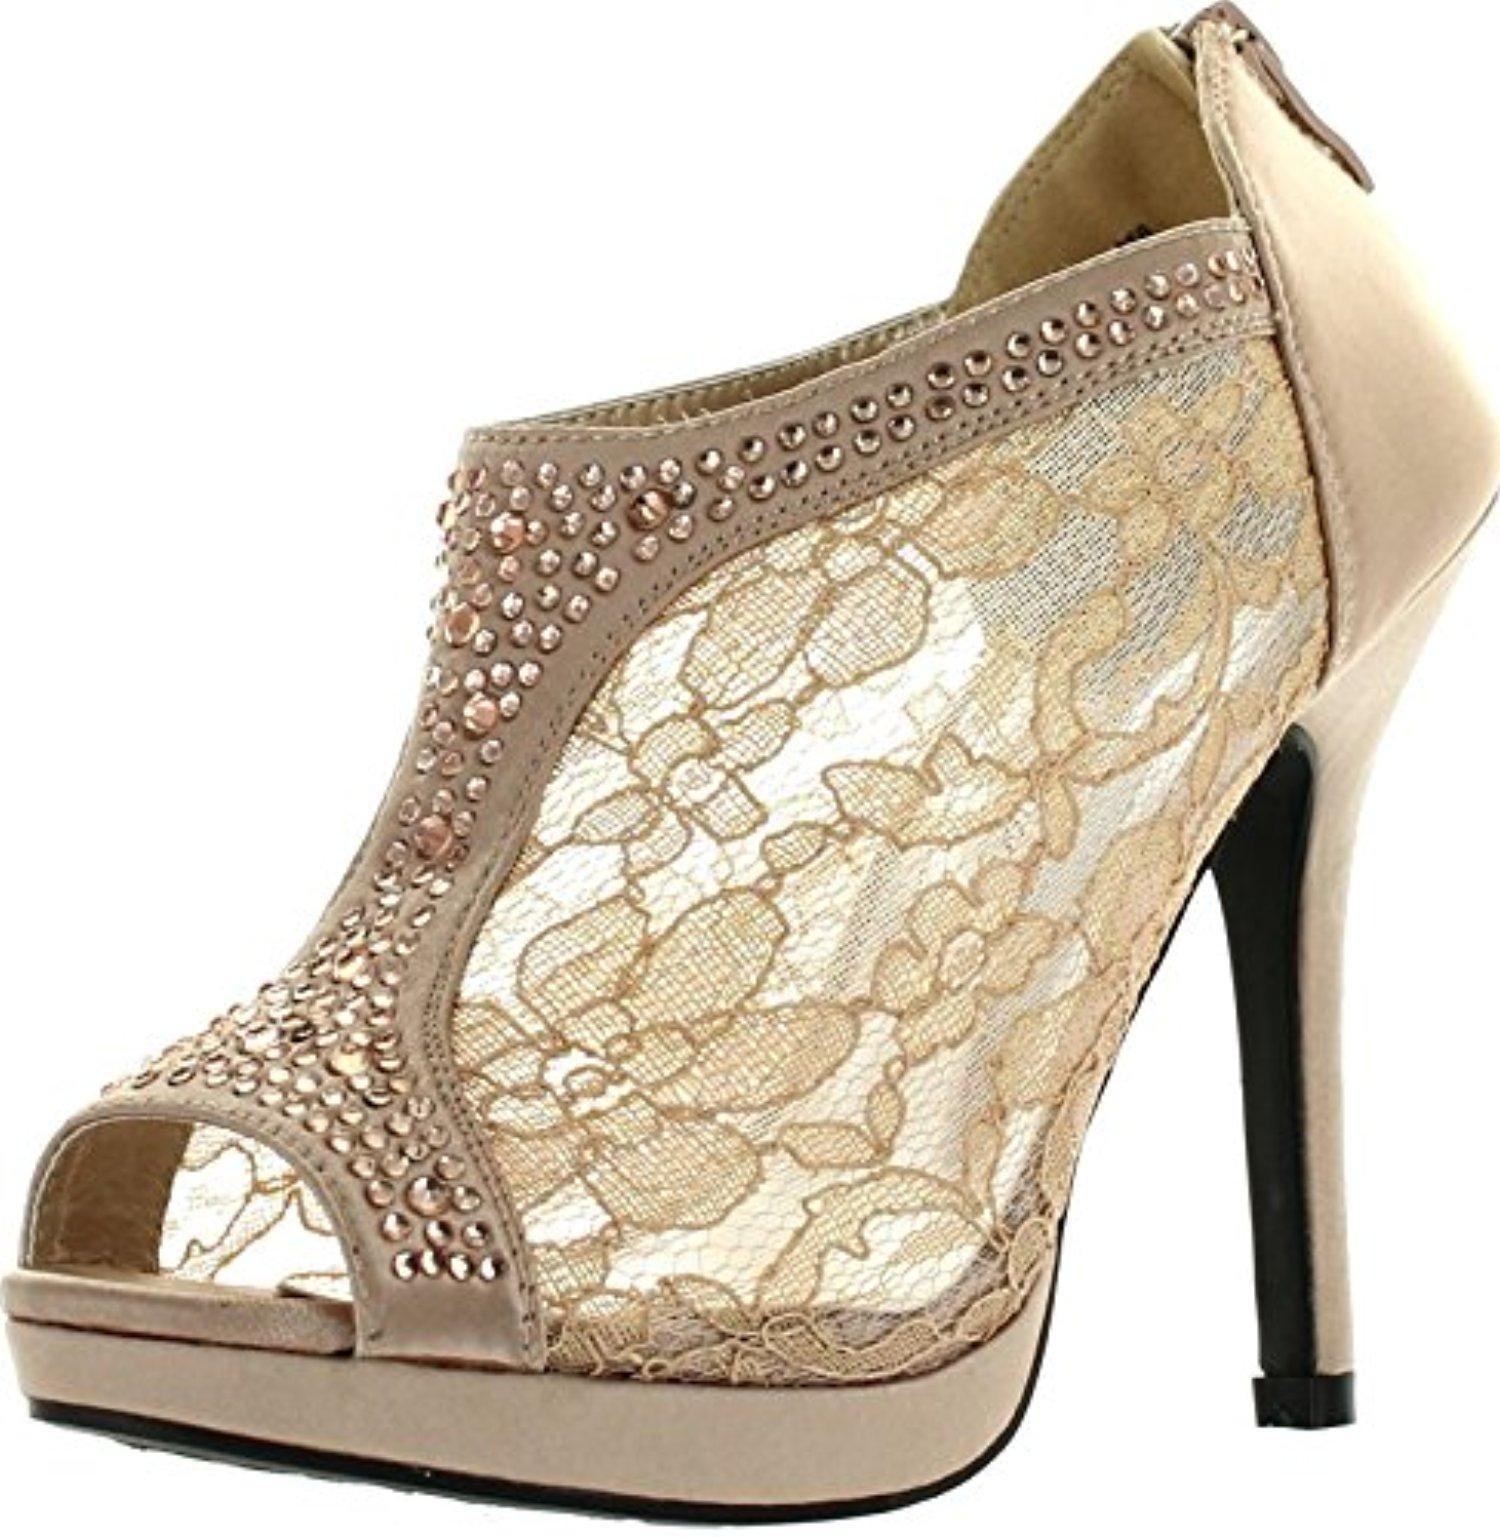 a5150a7afd7 De Blossom Yael-9 Womens Wedding Bridal High Heel Platform Cystal Lace  Ankle Bootie Shoes